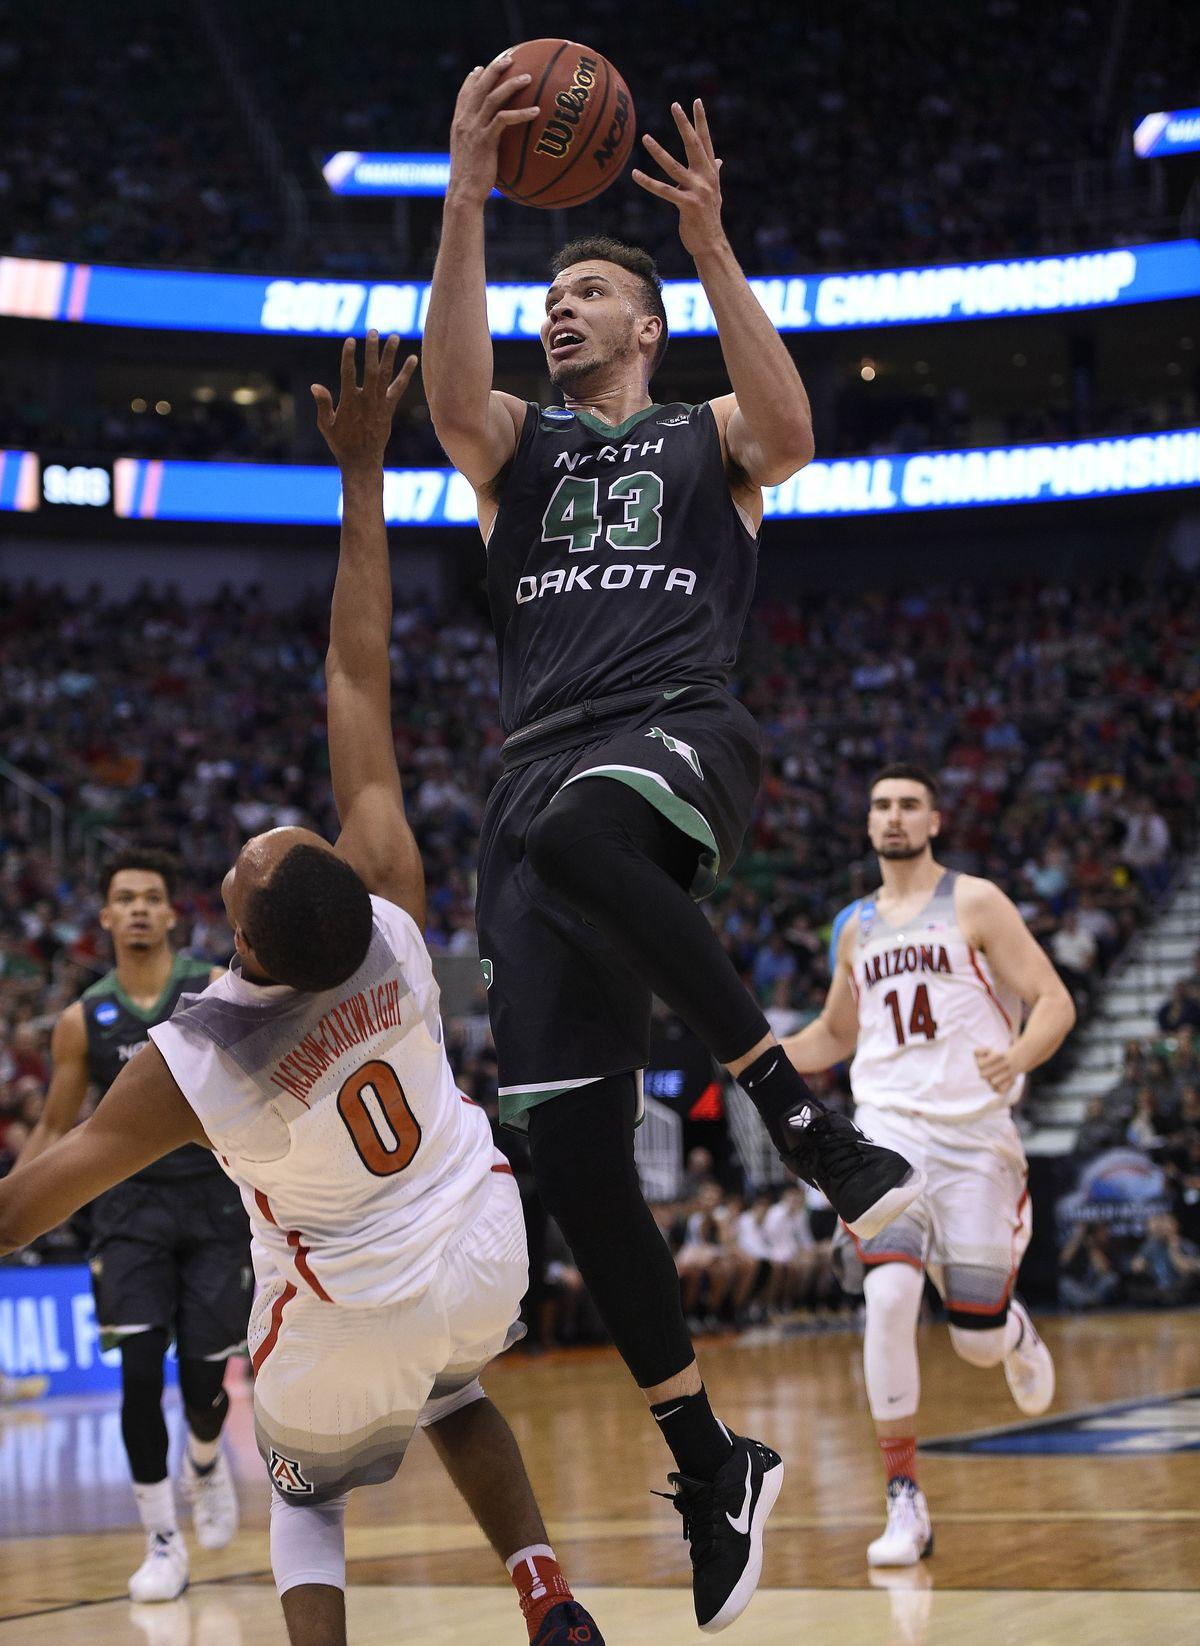 NCAA Basketball: NCAA Tournament-First Round-Arizona vs North Dakota